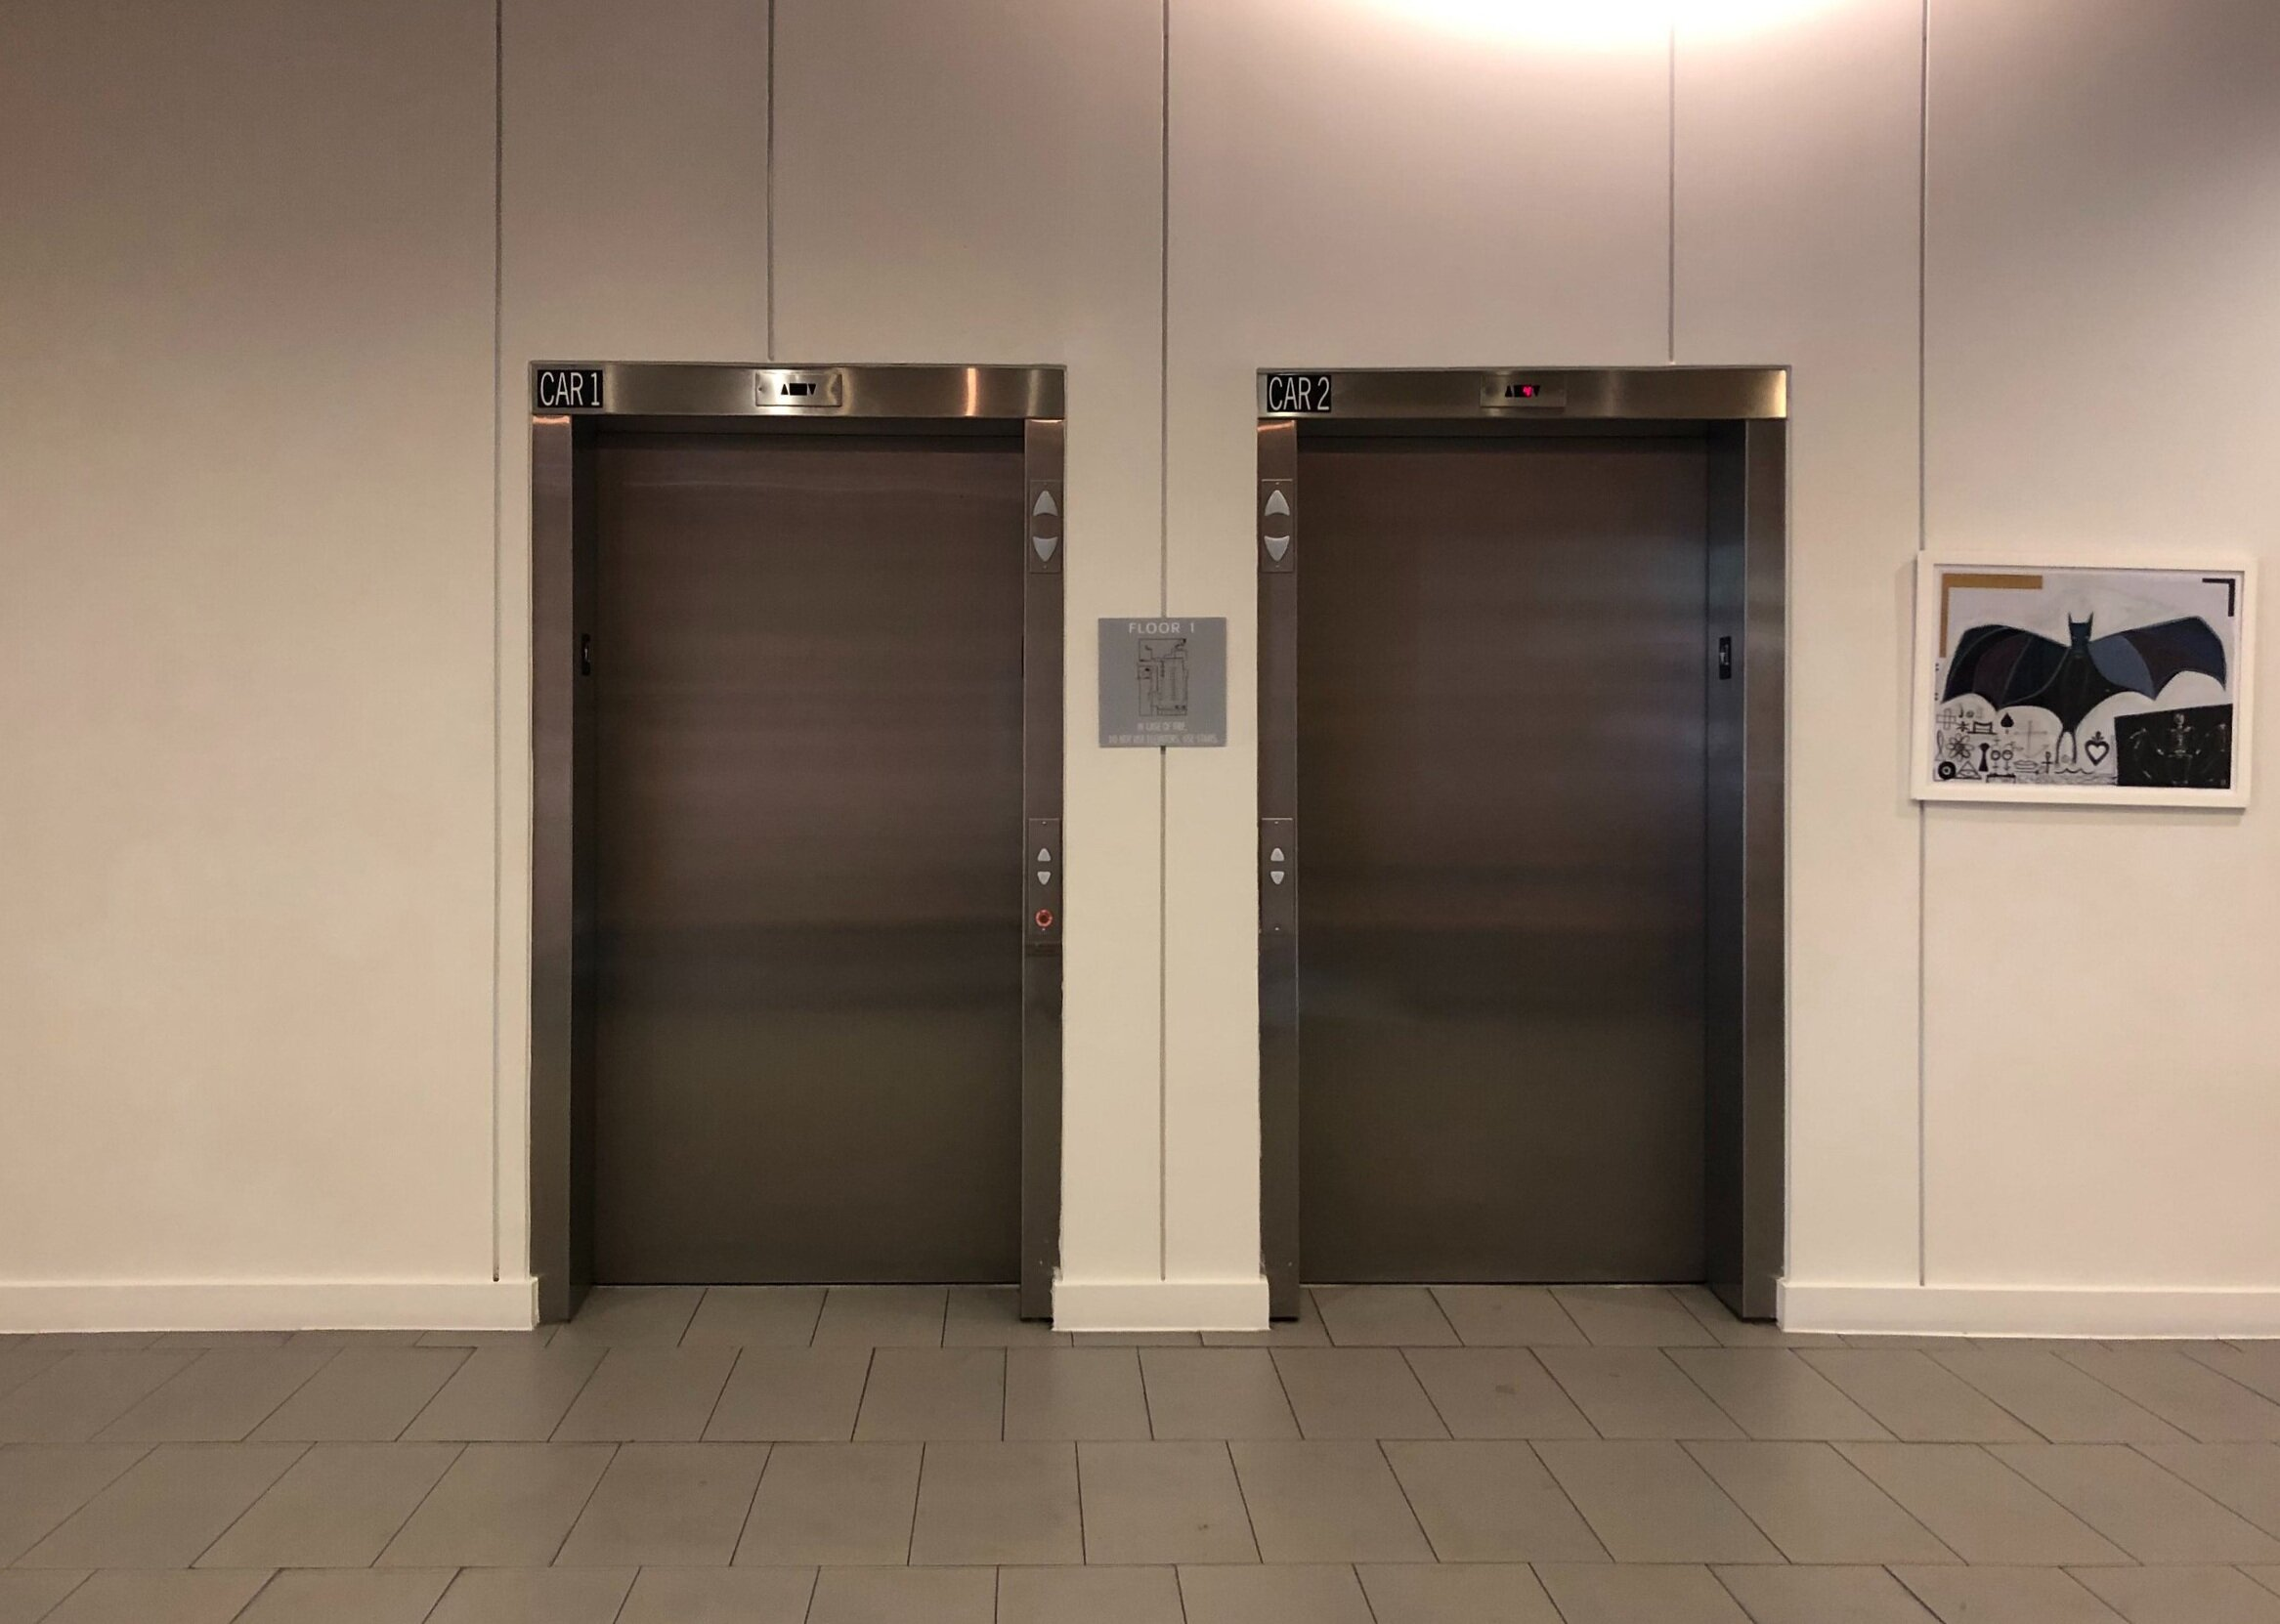 GLU+bldg1+Elevators.jpg